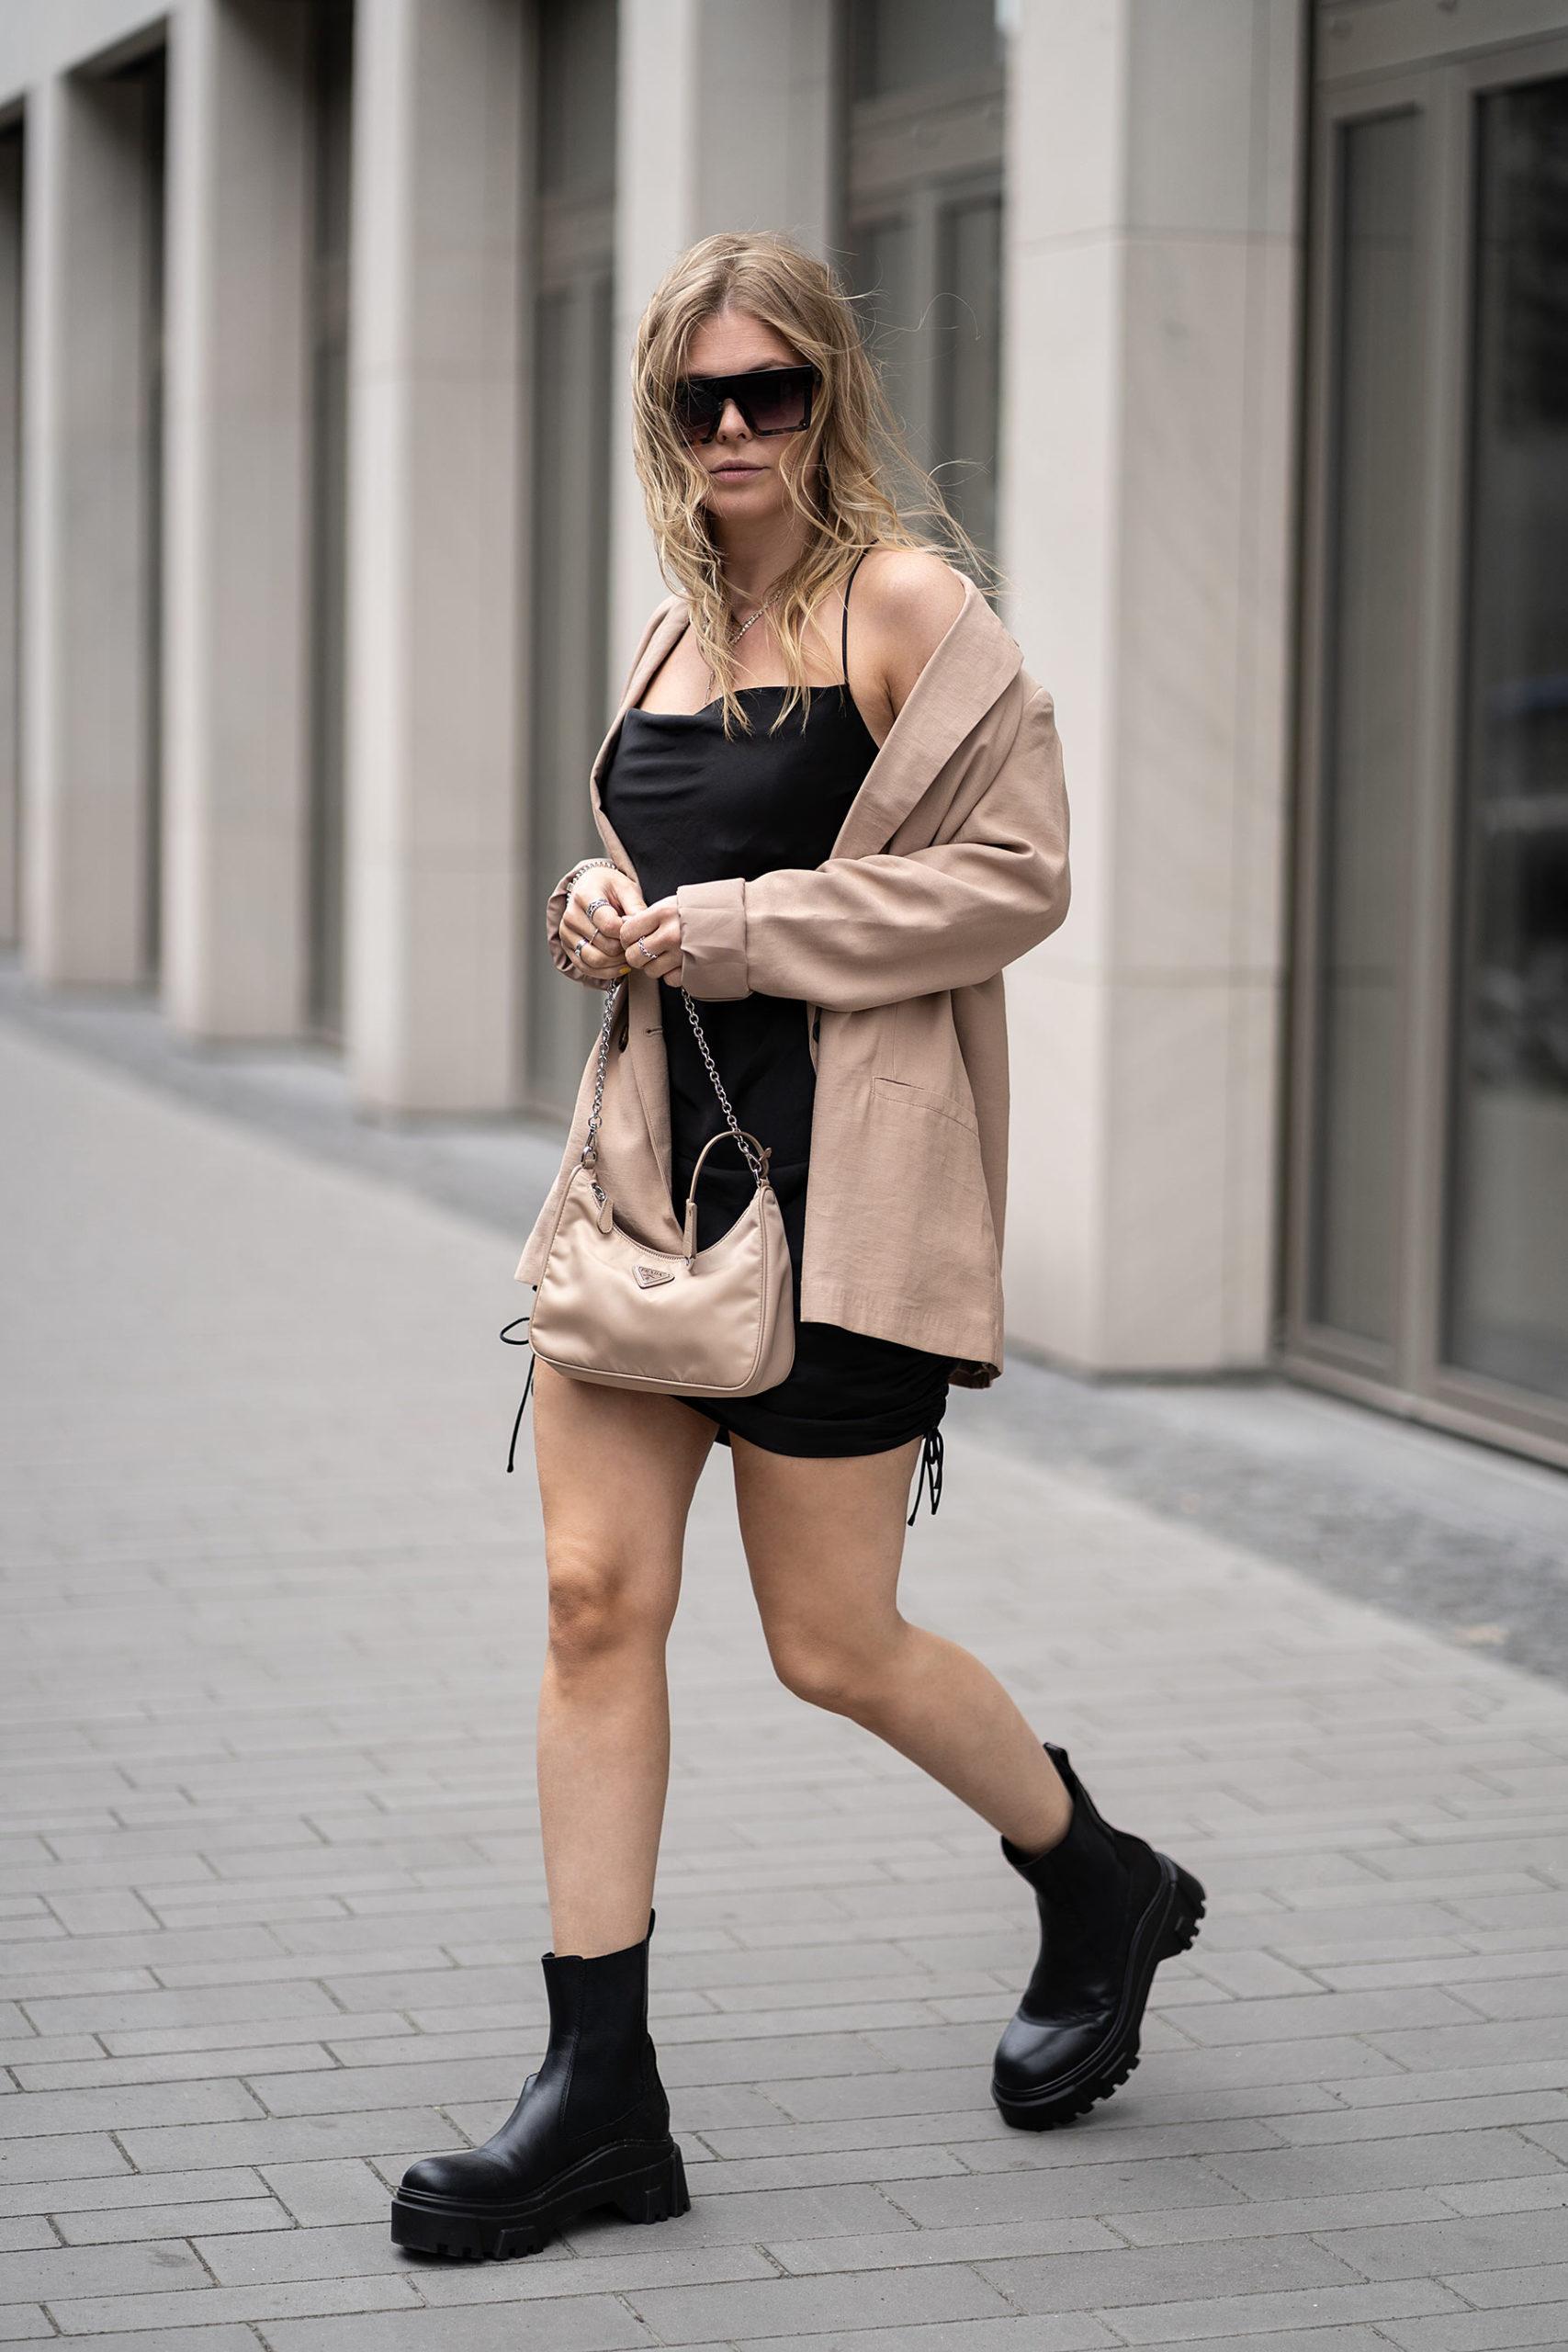 boots kleid outfit streetstyle fashion inga brauer